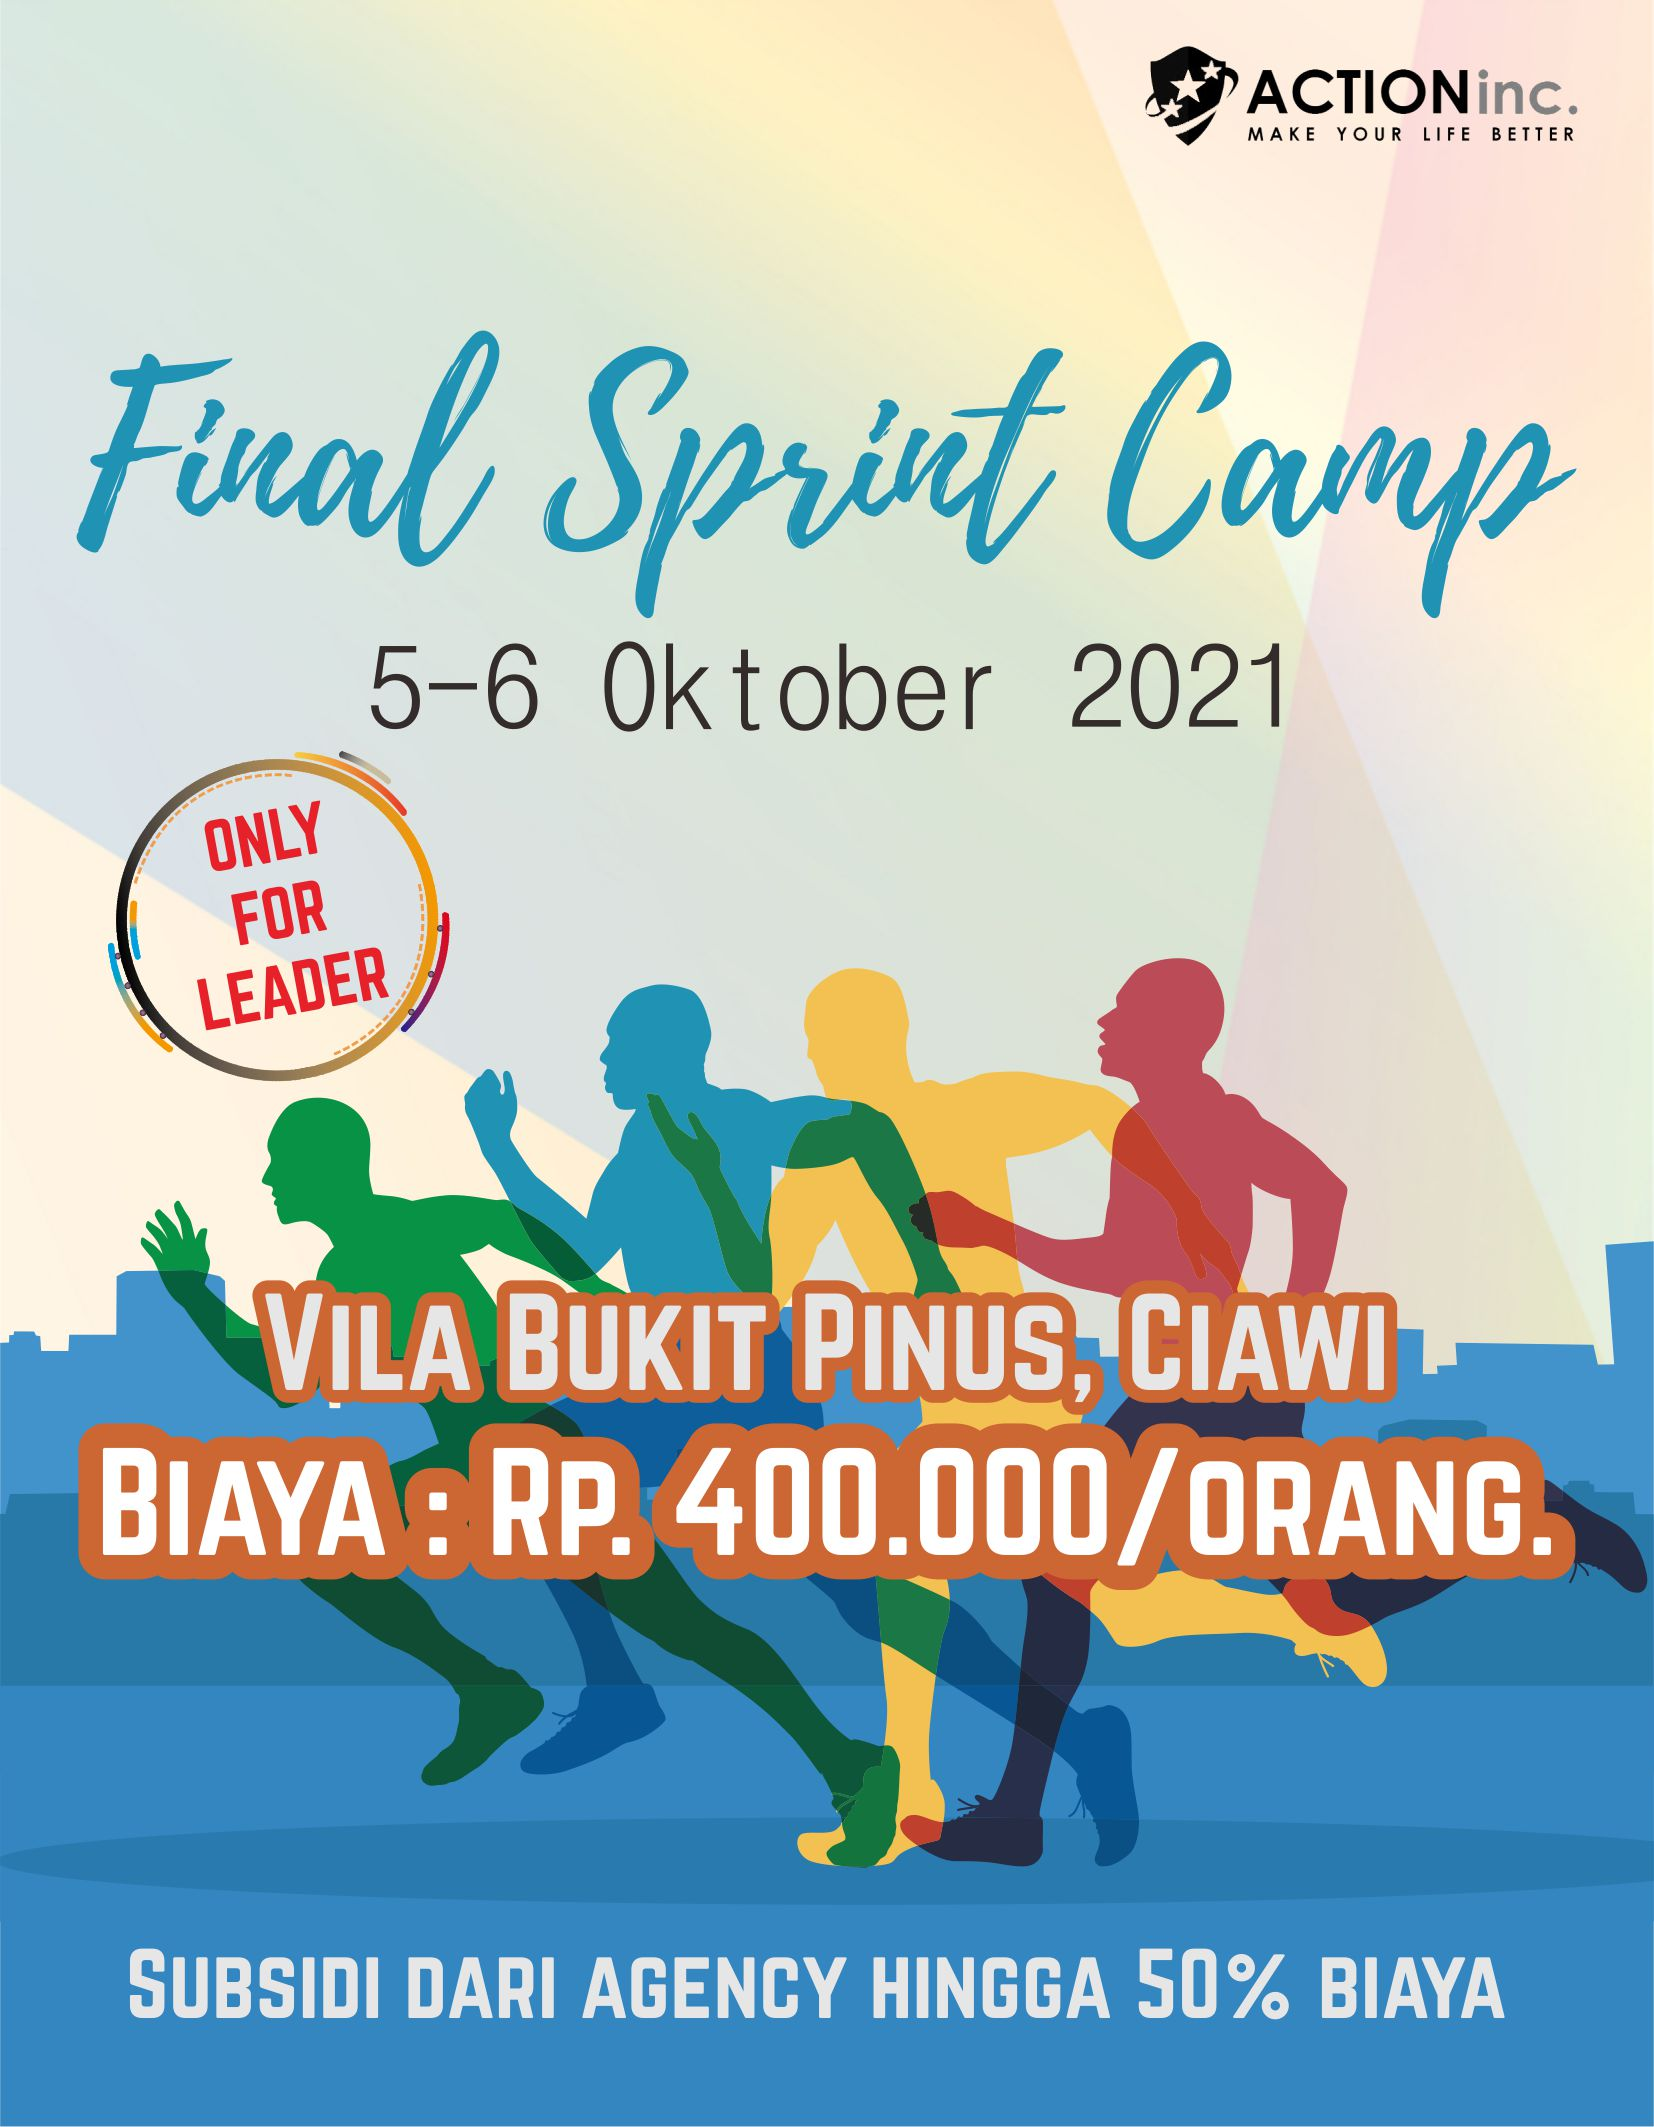 FINAL SPRINT CAMP  5 - 6 Oktober 2021